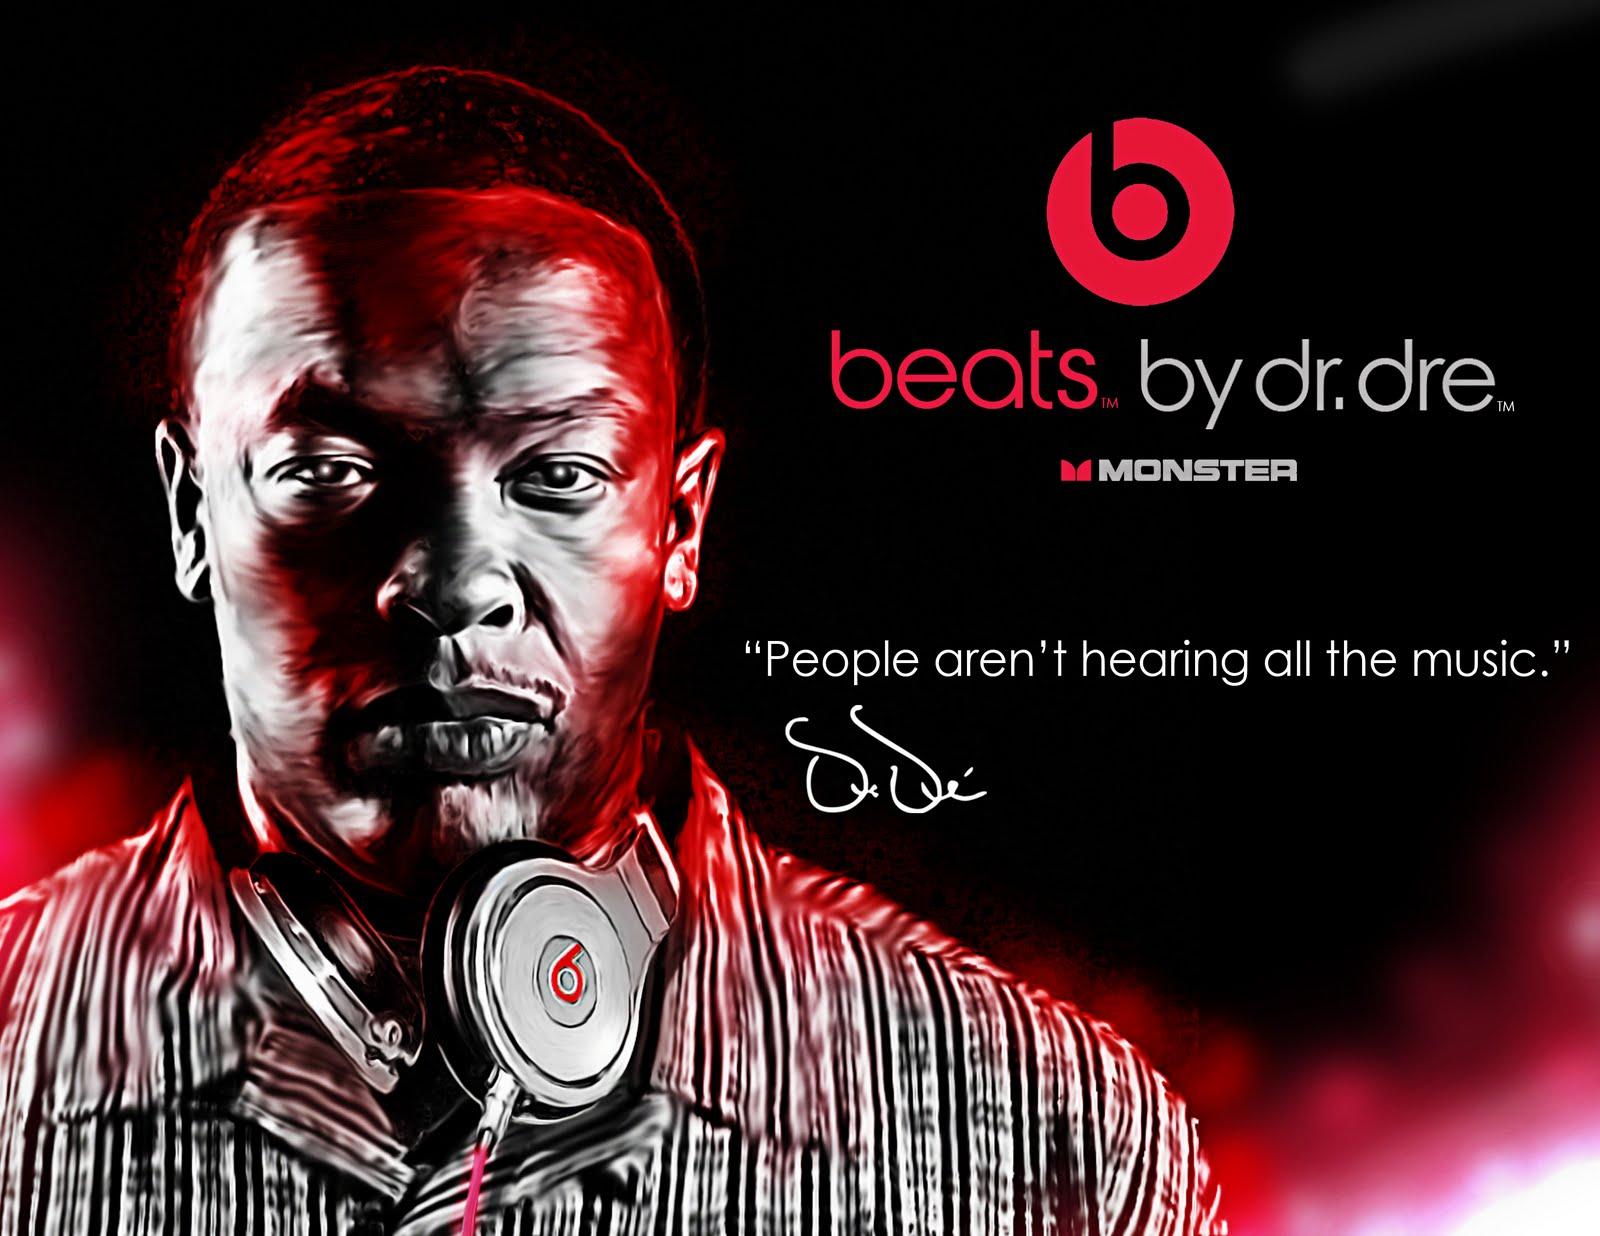 beats-by-dr-dre-207920.jpg